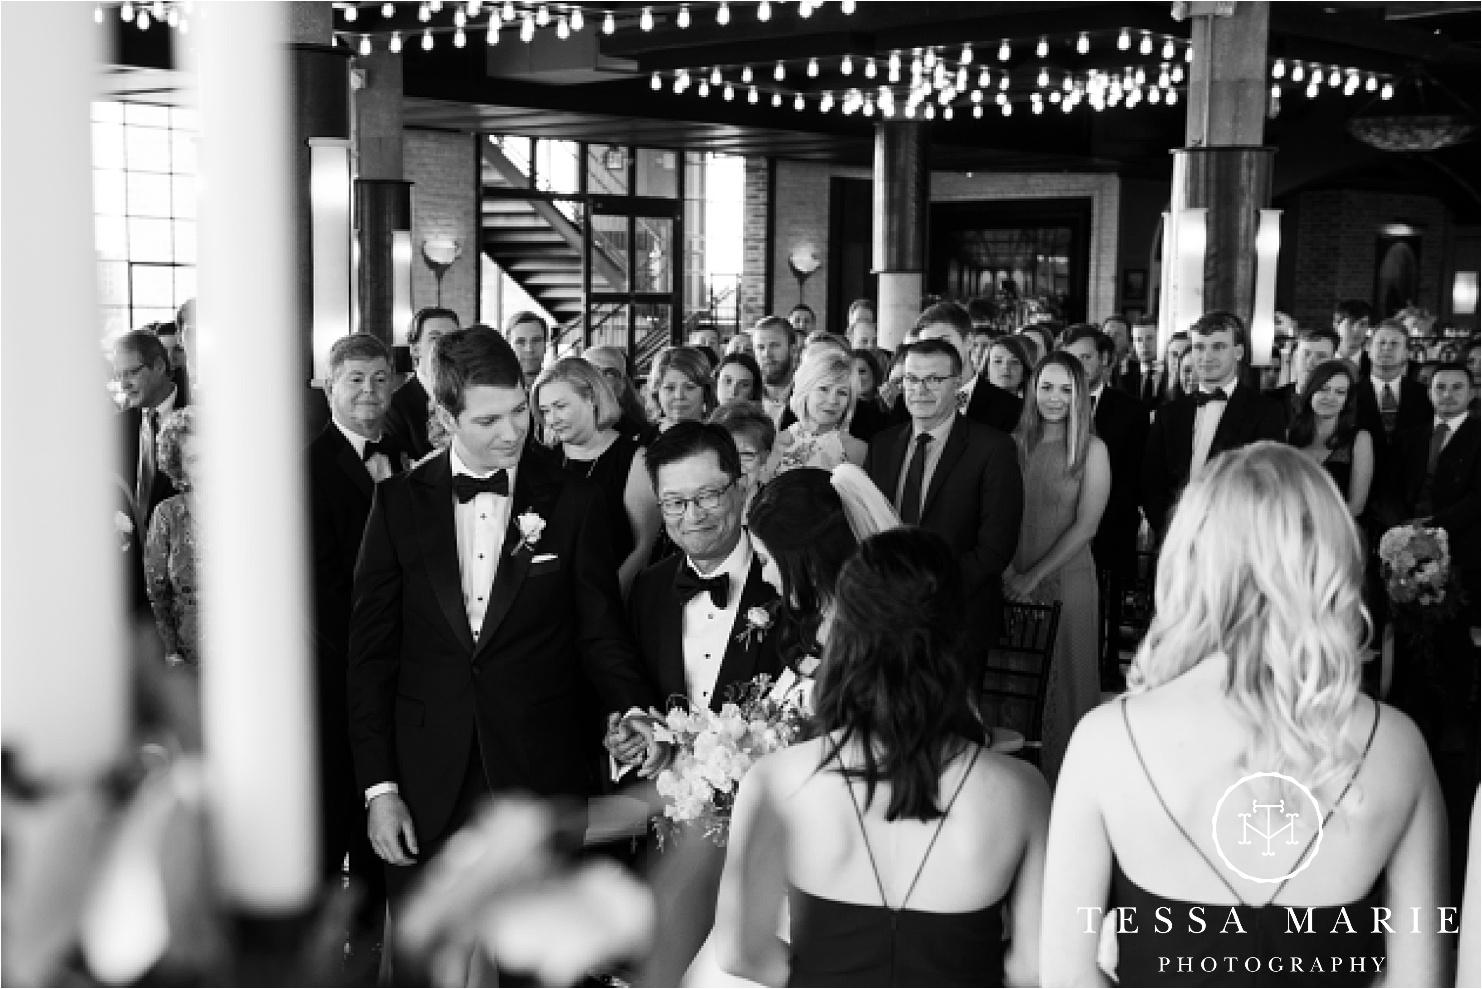 Tessa_marie_weddings_houston_wedding_photographer_The_astorian_0113.jpg